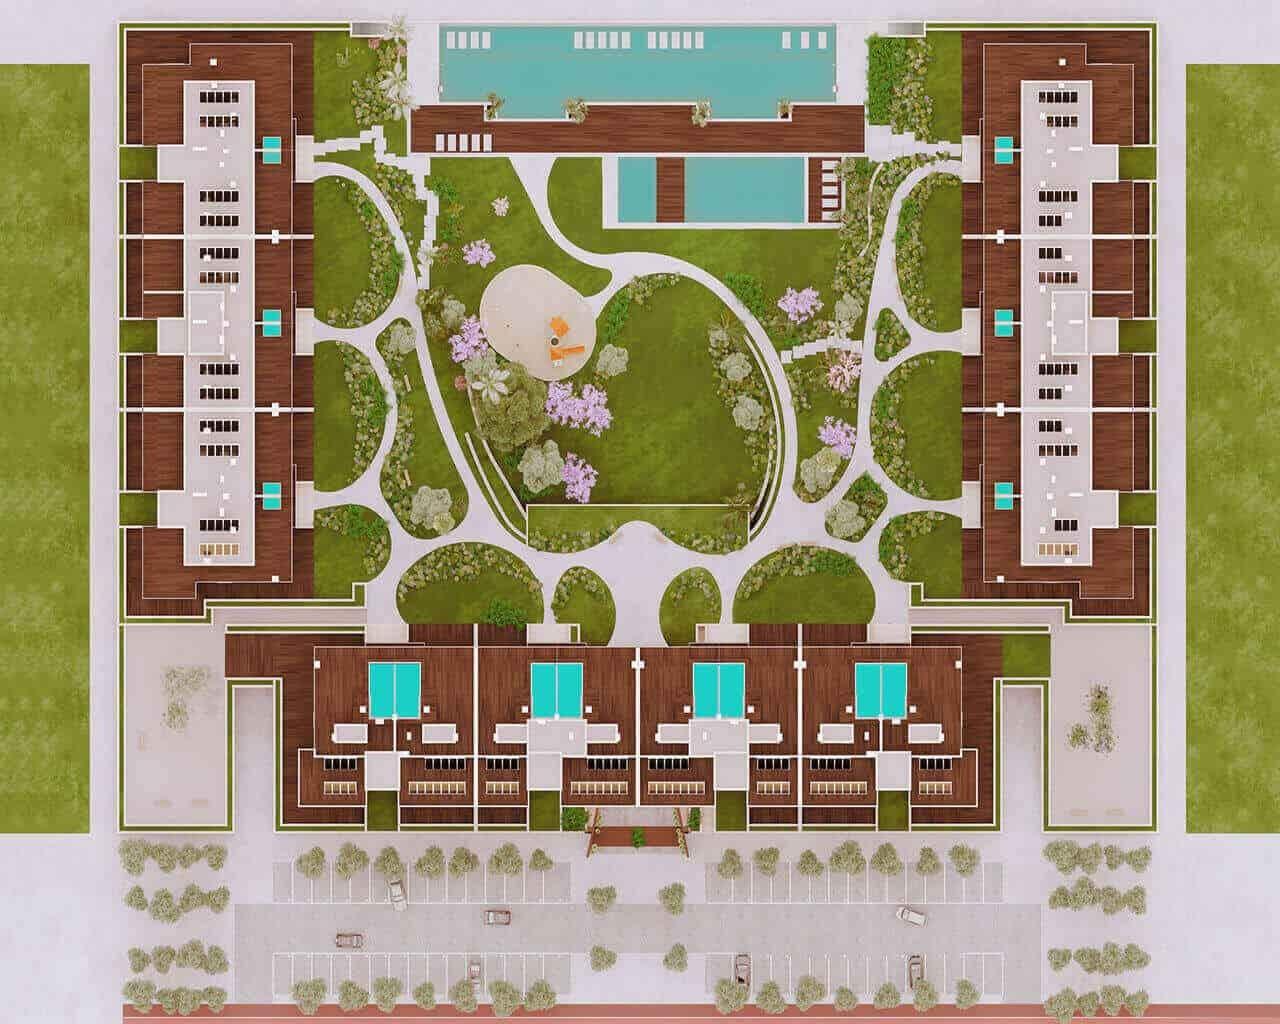 Tagus Bay - Plan 2D